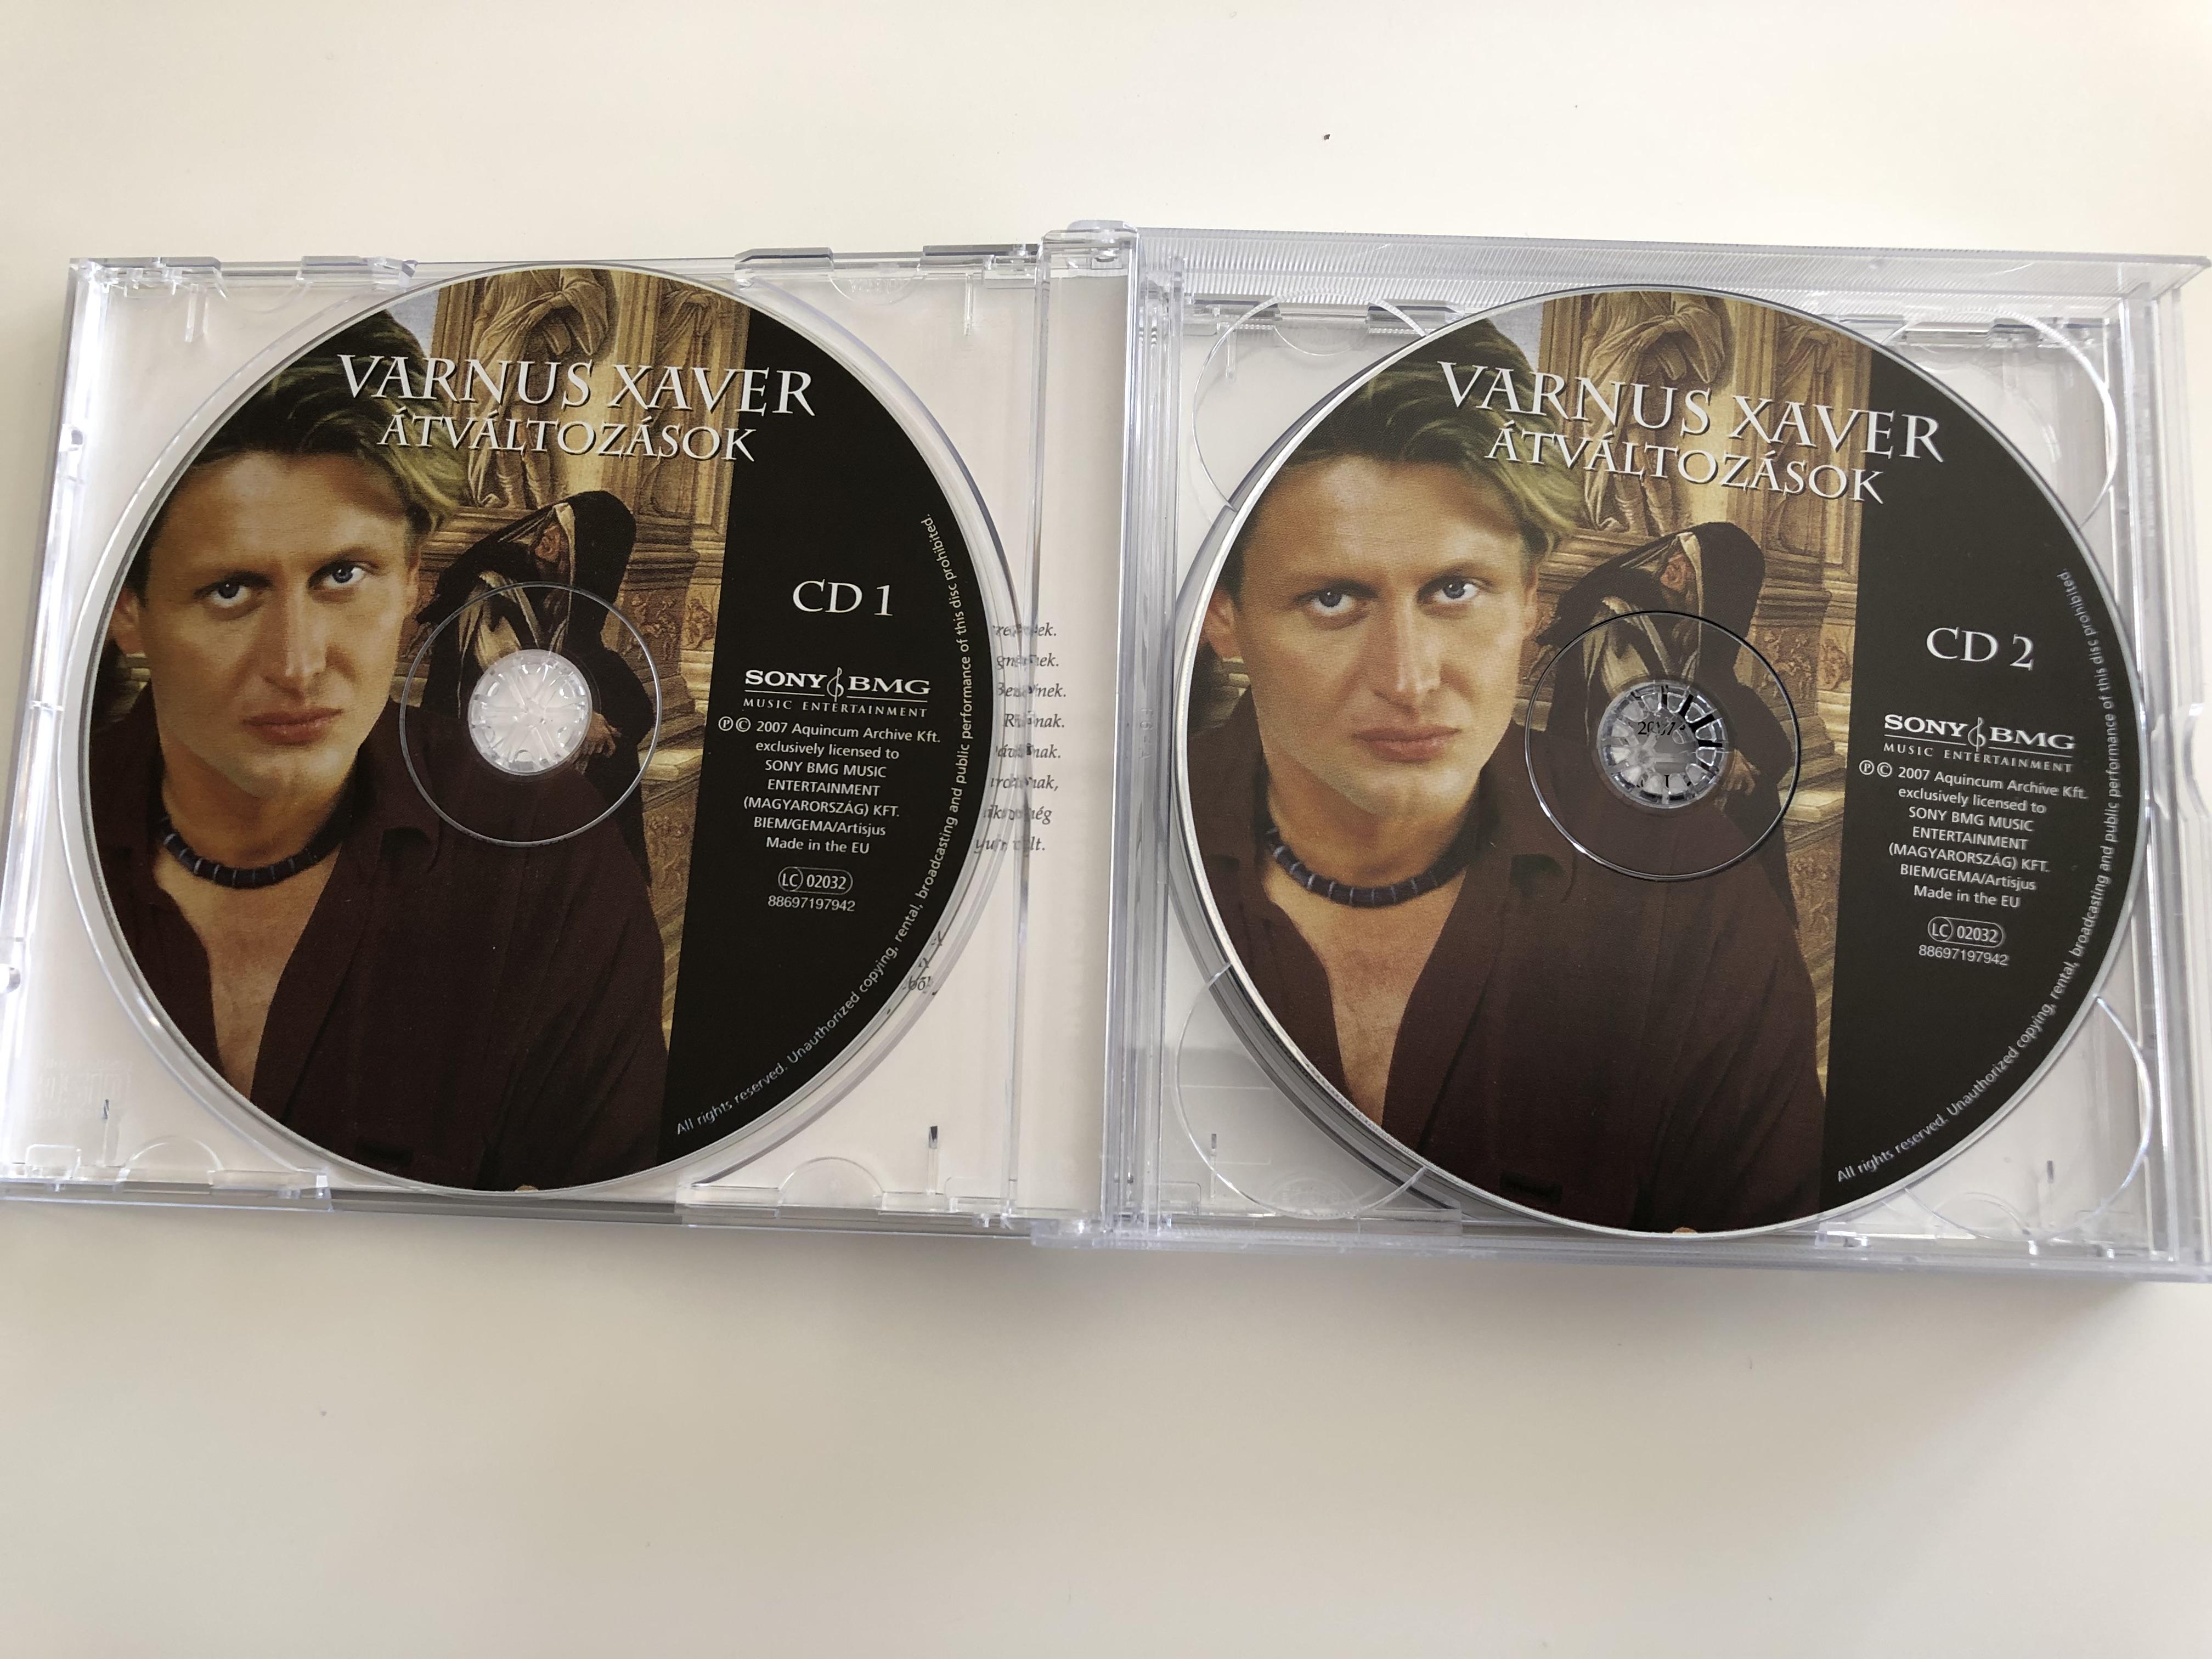 -tv-ltoz-sok-by-varnus-xaver-3-cd-audio-book-the-audio-version-of-the-novel-music-by-varnus-xaver-sony-music-entertainment-2003-4-.jpg